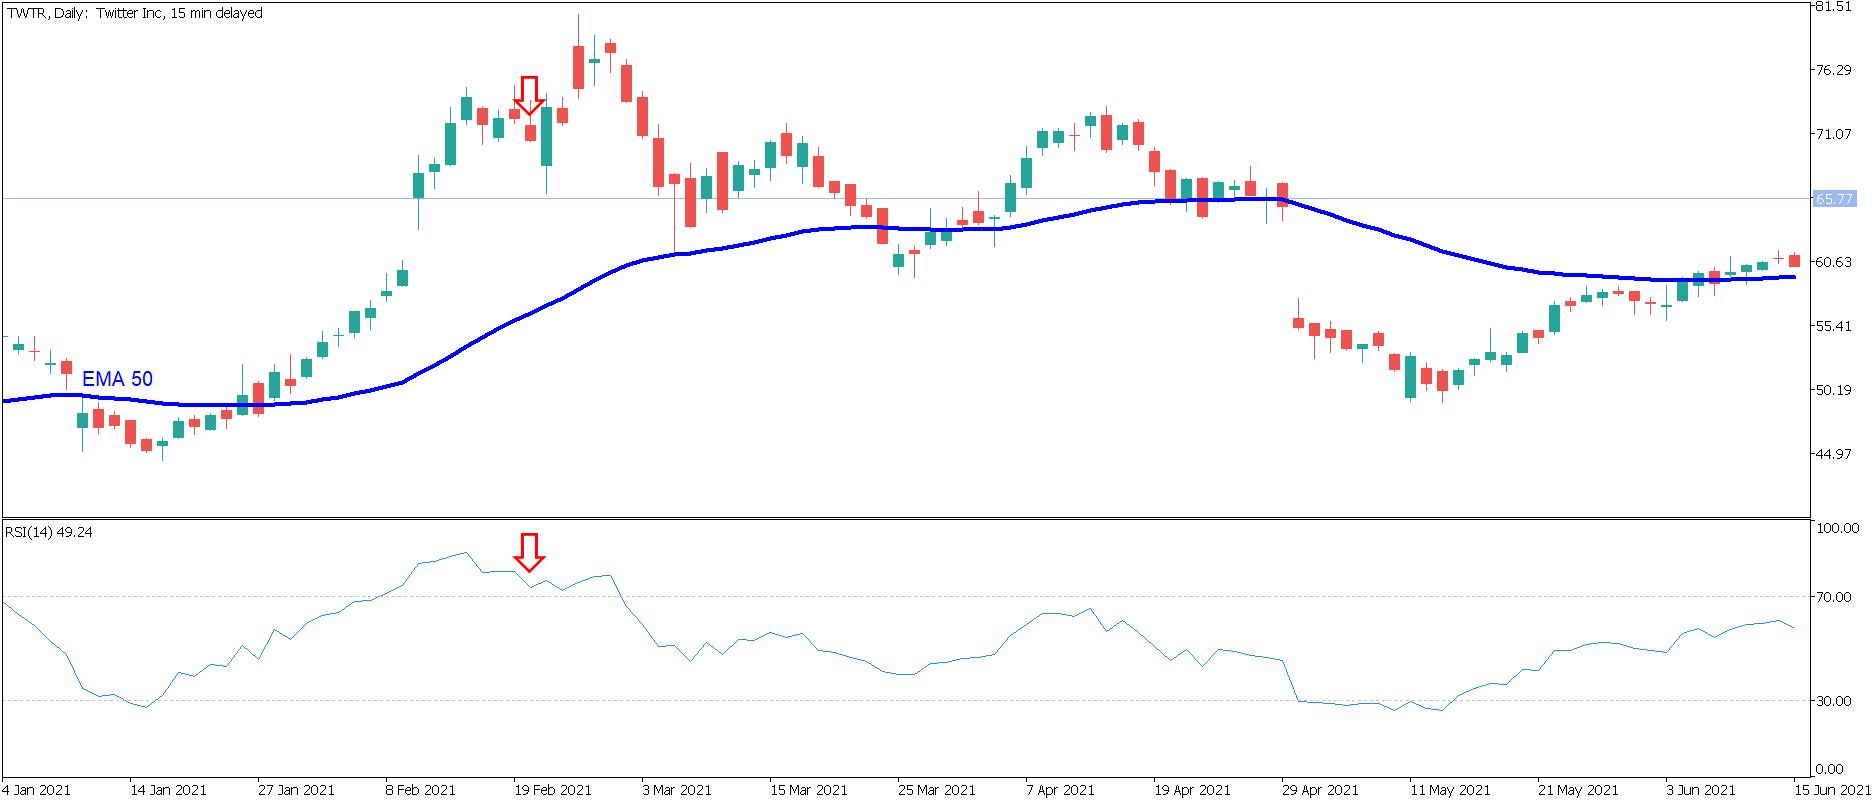 Wykres strategii Pair Trading 2